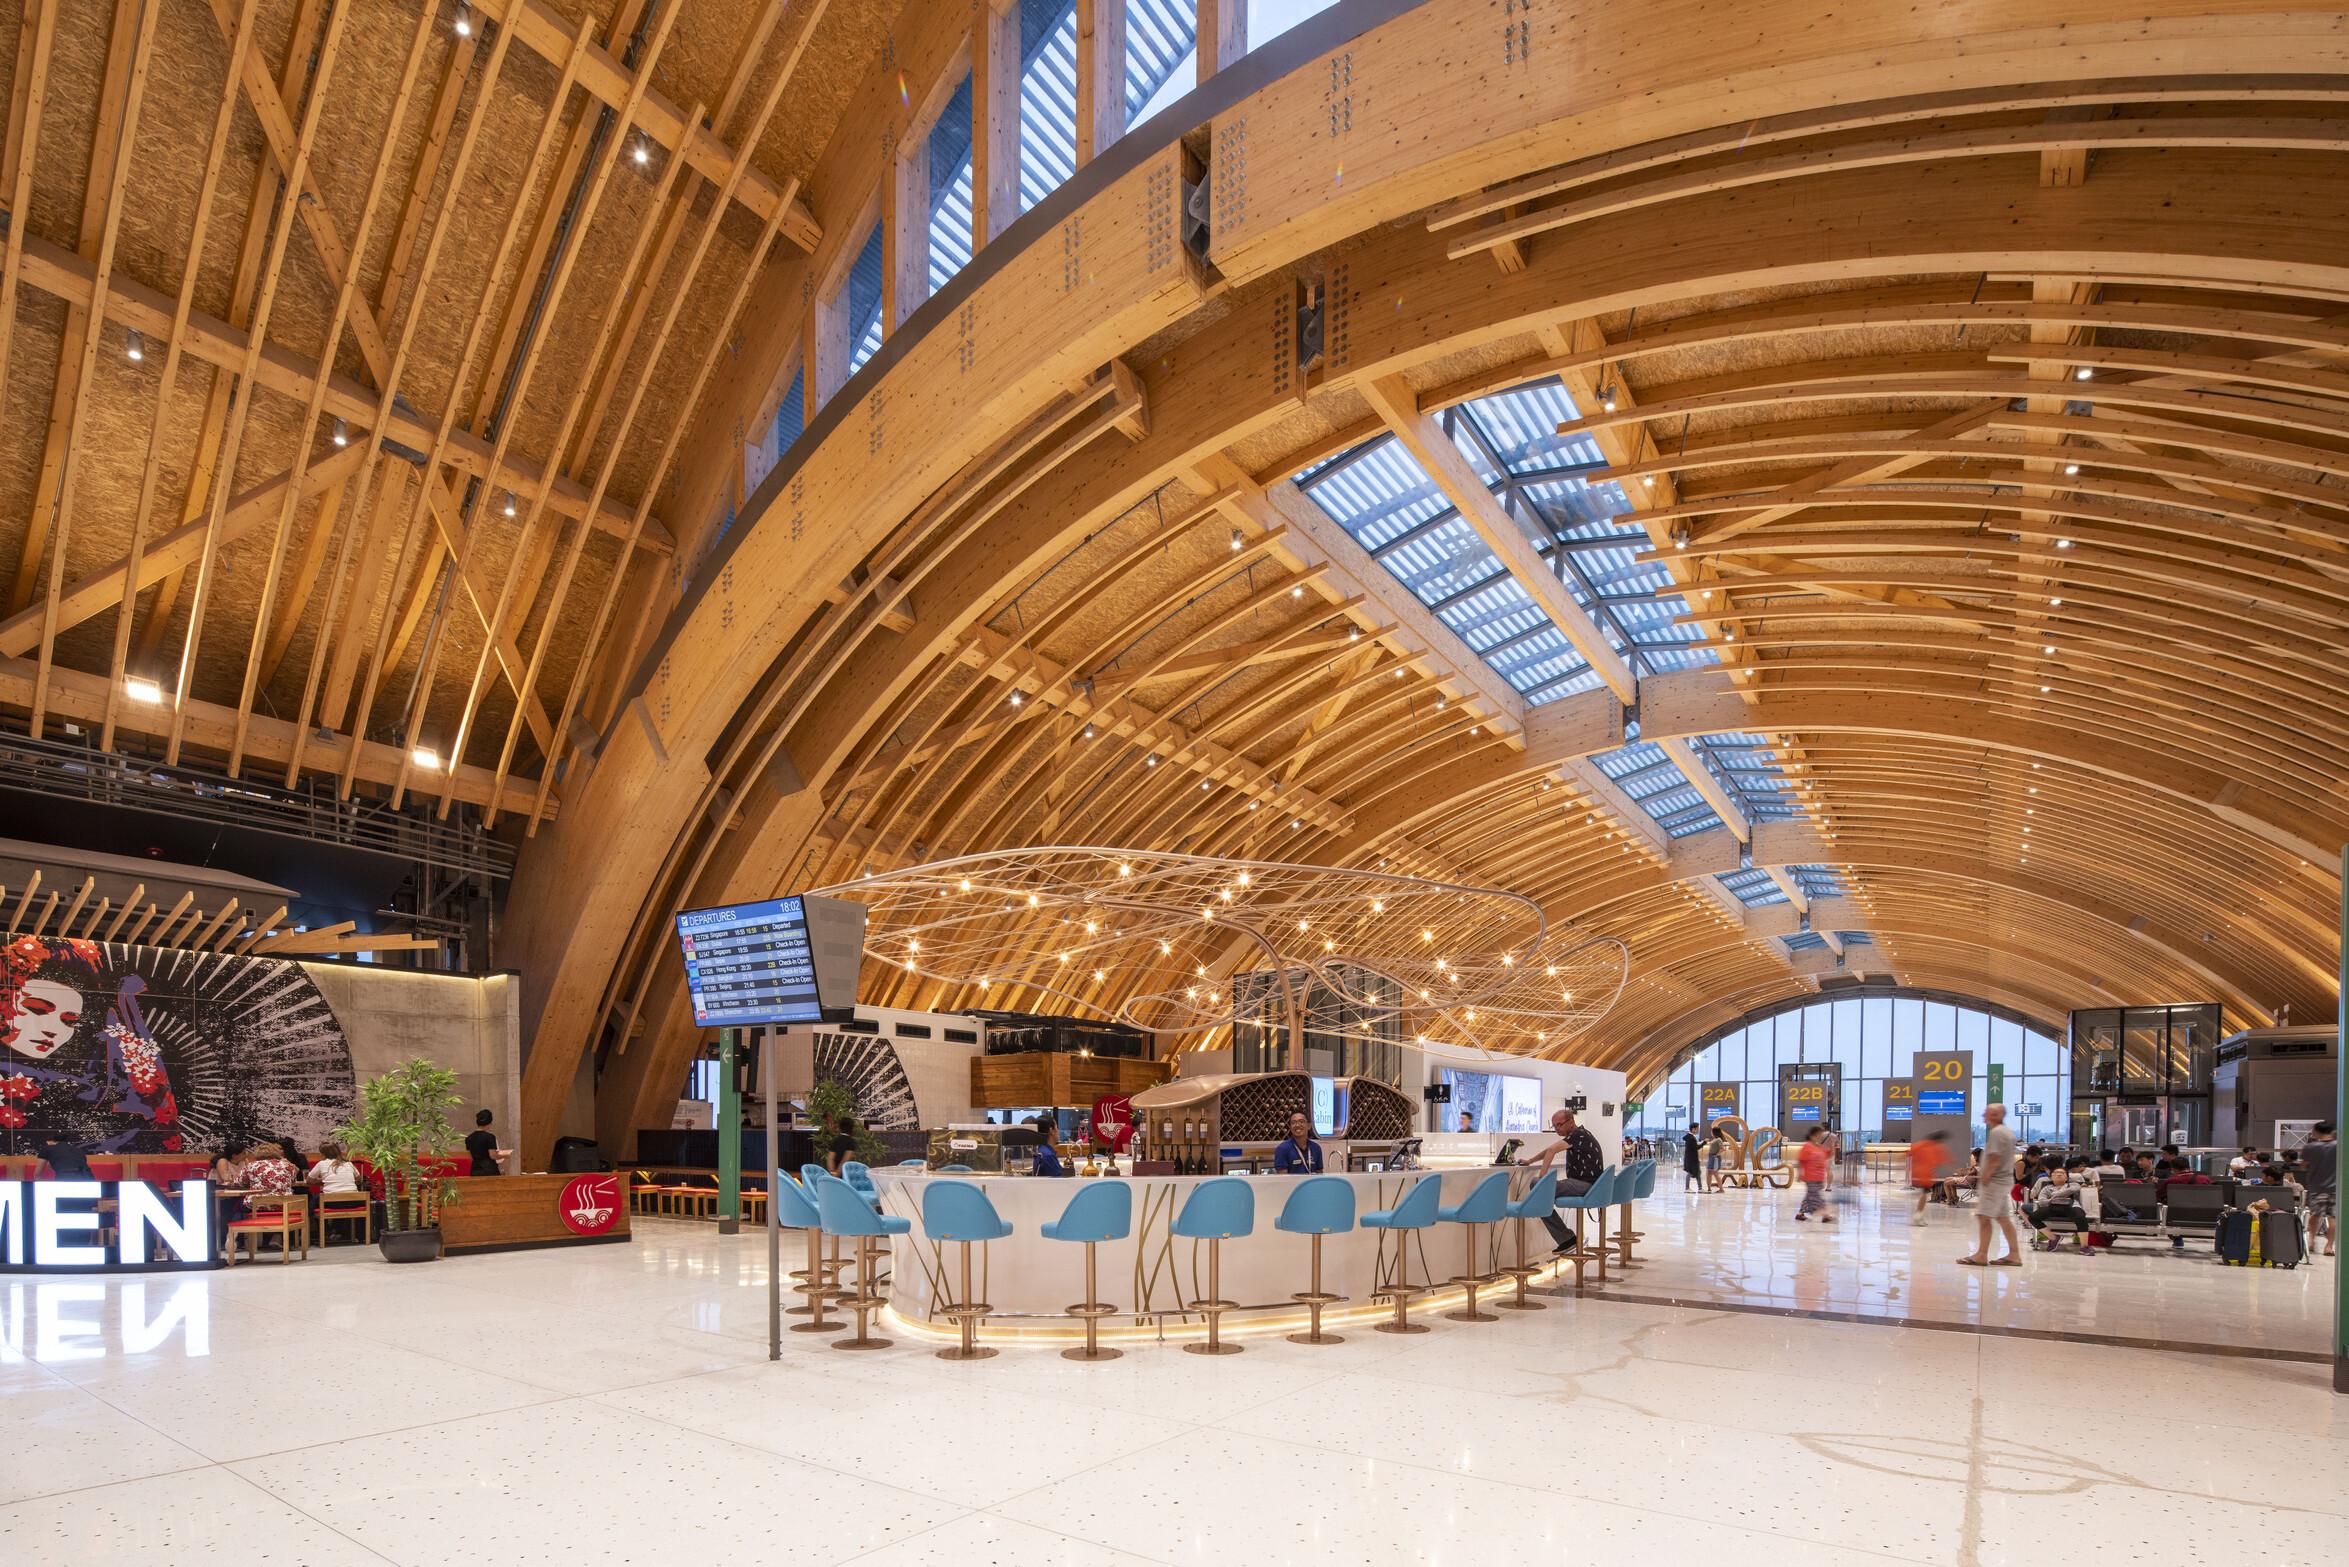 Timber roof - embodying circular economy principles (Mactan Cebu International Airport Terminal 2) © Marcel Lam Photography